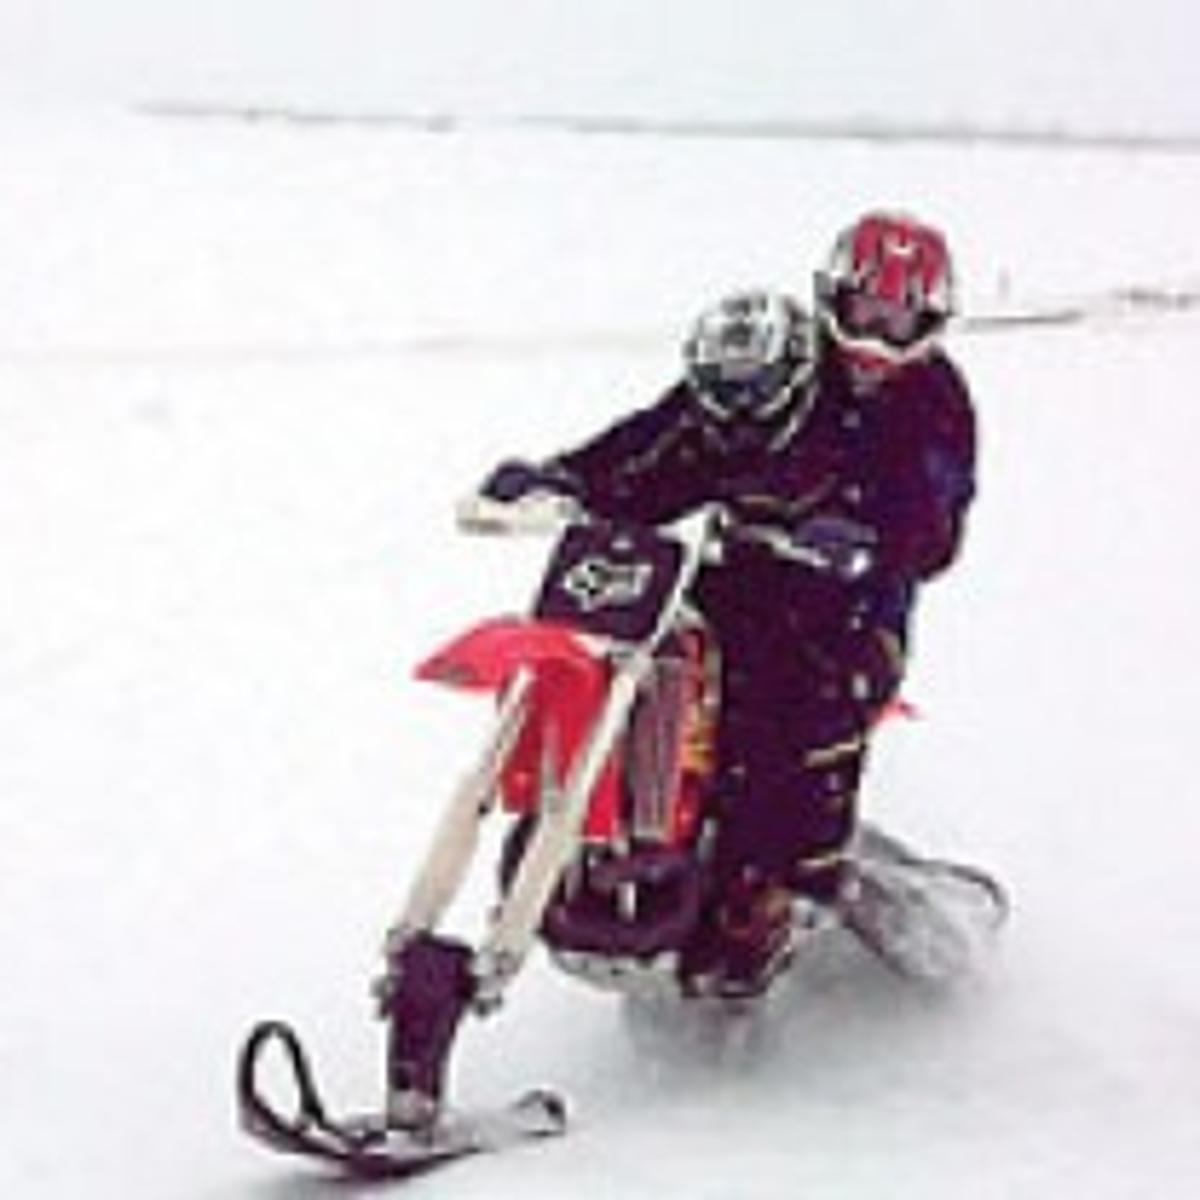 Dirt Bike Snowmobile >> Riding Dirt Bike Converted Into A Snowmobile Is A Lot Of Fun